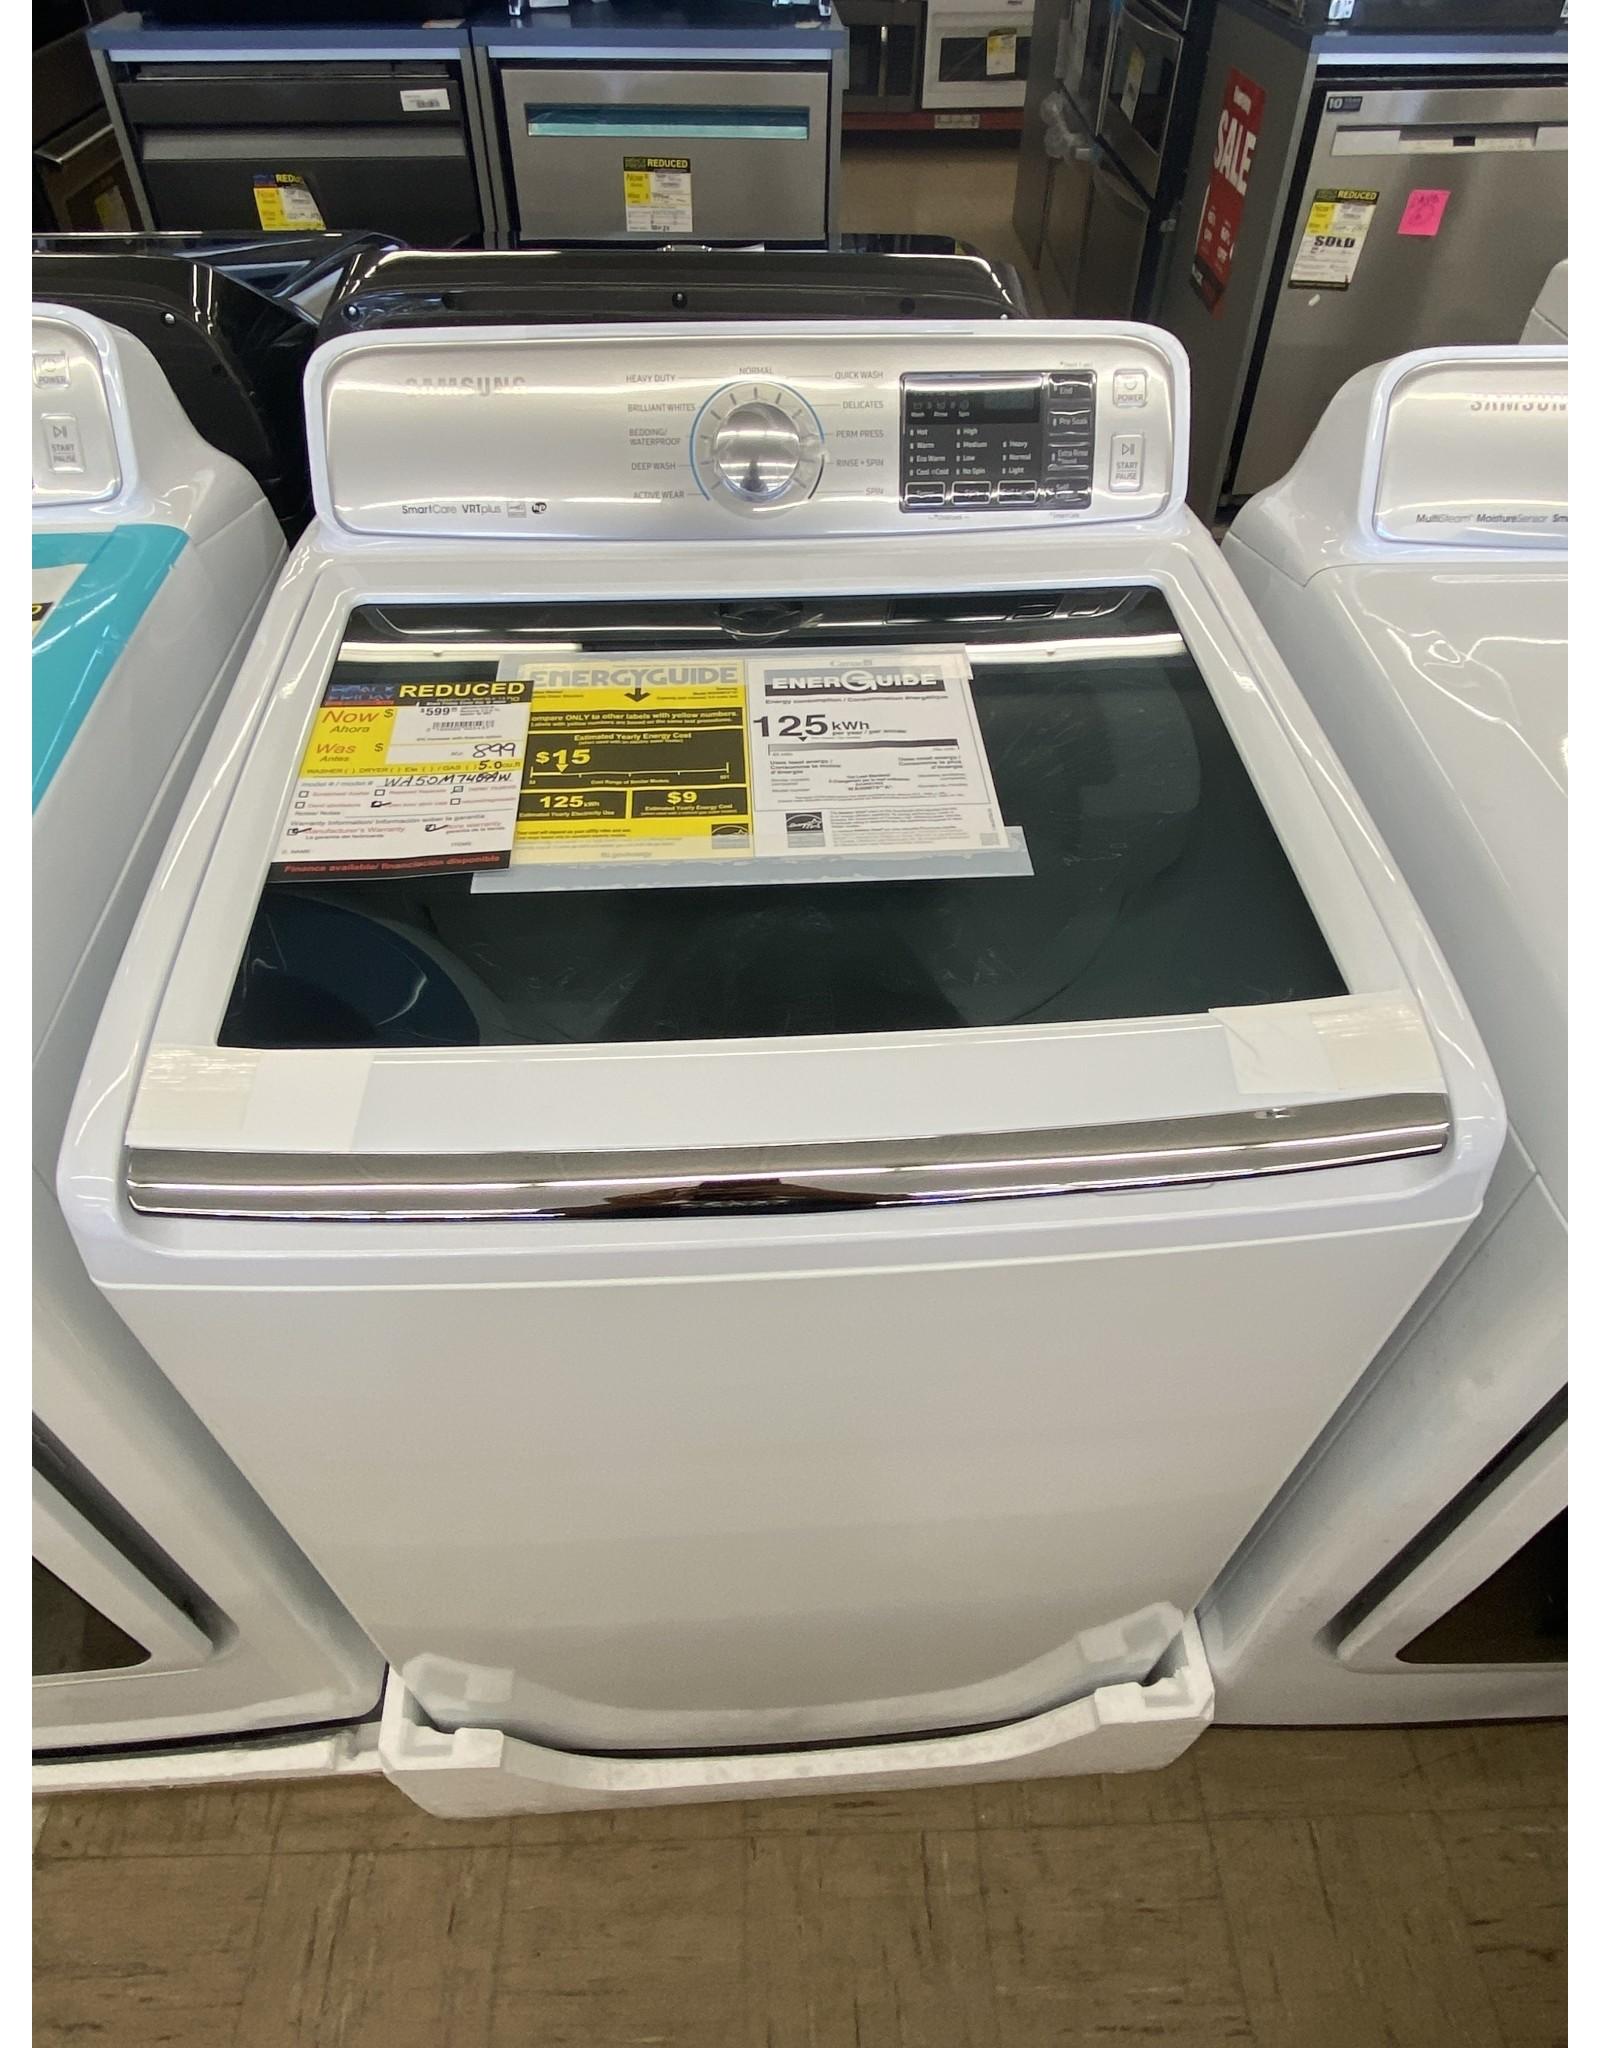 SAMSUNG WA50M7450AW Samsung 5.0 cf TL washer w/ VRT